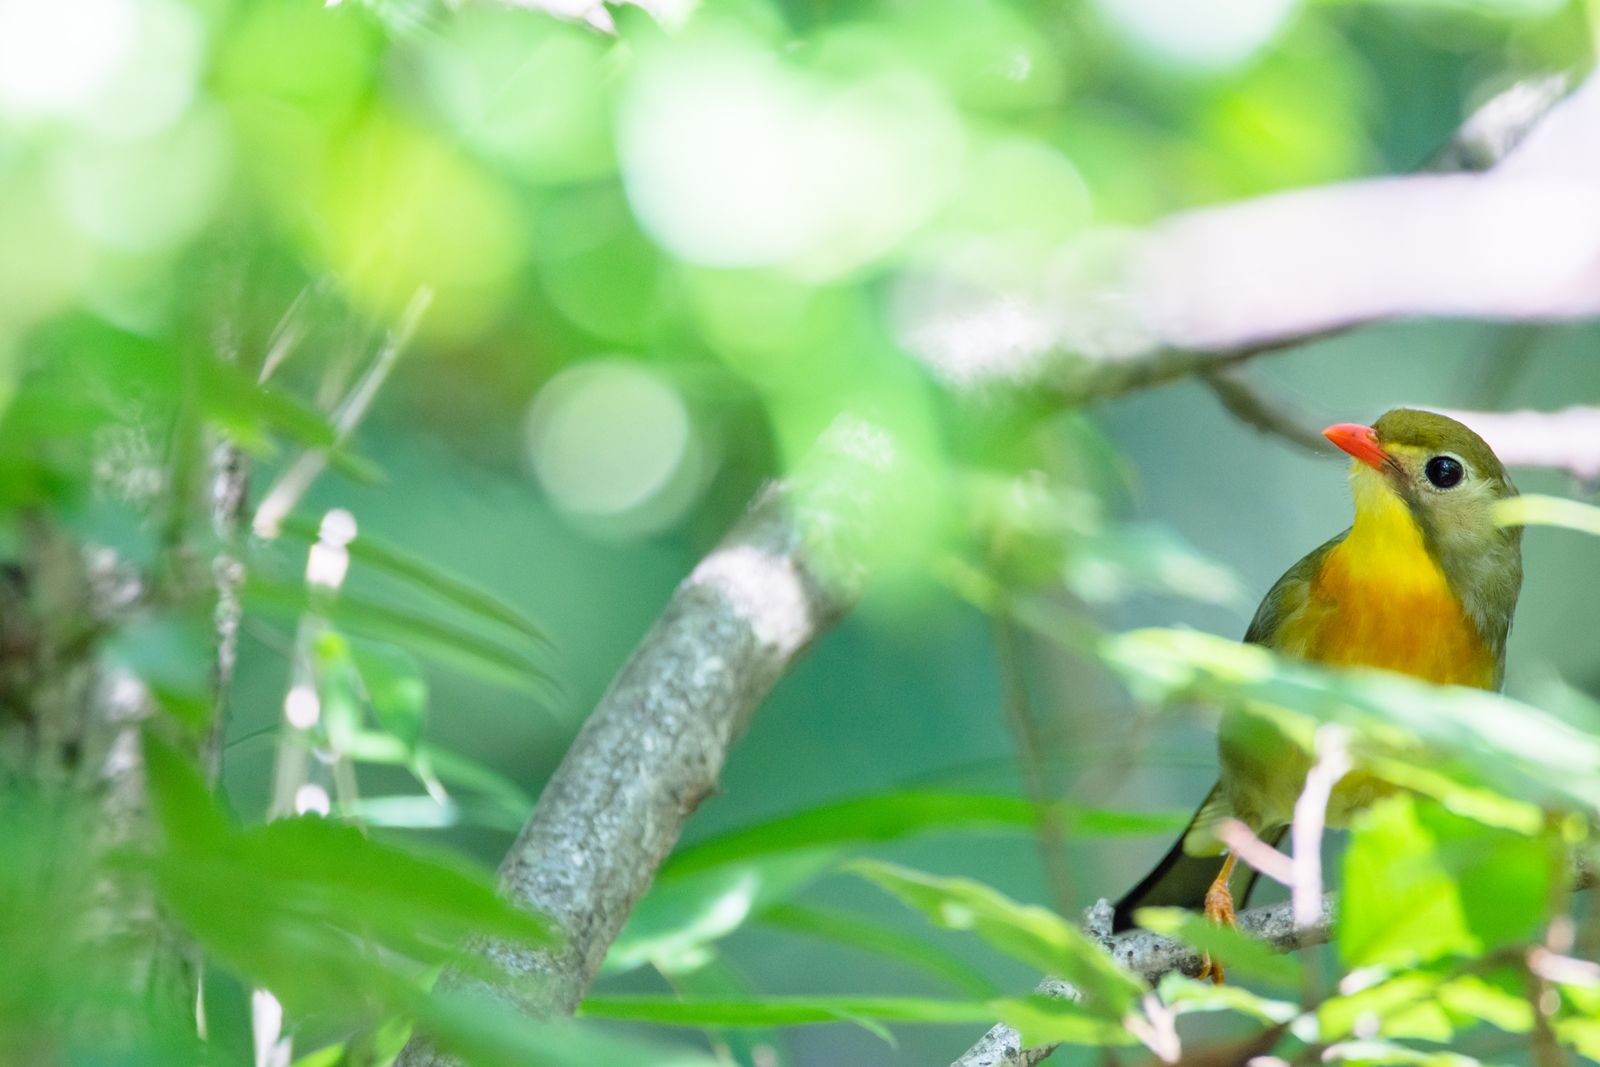 Photo: 鮮やかな森へ Vivid early summer forest.  森は雨季を迎え 空気は湿り気を帯び 空からの恵みをたくわえる 射し込む光に 息吹を溢れさせる  Red-billed leiothrix. (ソウシチョウ)  #birdphotography #birds #cooljapan #kawaii #nikon #sigma  Nikon D7200 SIGMA 150-600mm F5-6.3 DG OS HSM Contemporary  ・小鳥の詩朗読 /poetry reading https://youtu.be/a_ZWeLWqUcM?list=PL2YtHGm0-R3qVsaqvQe9OYdJFCkI98wzF